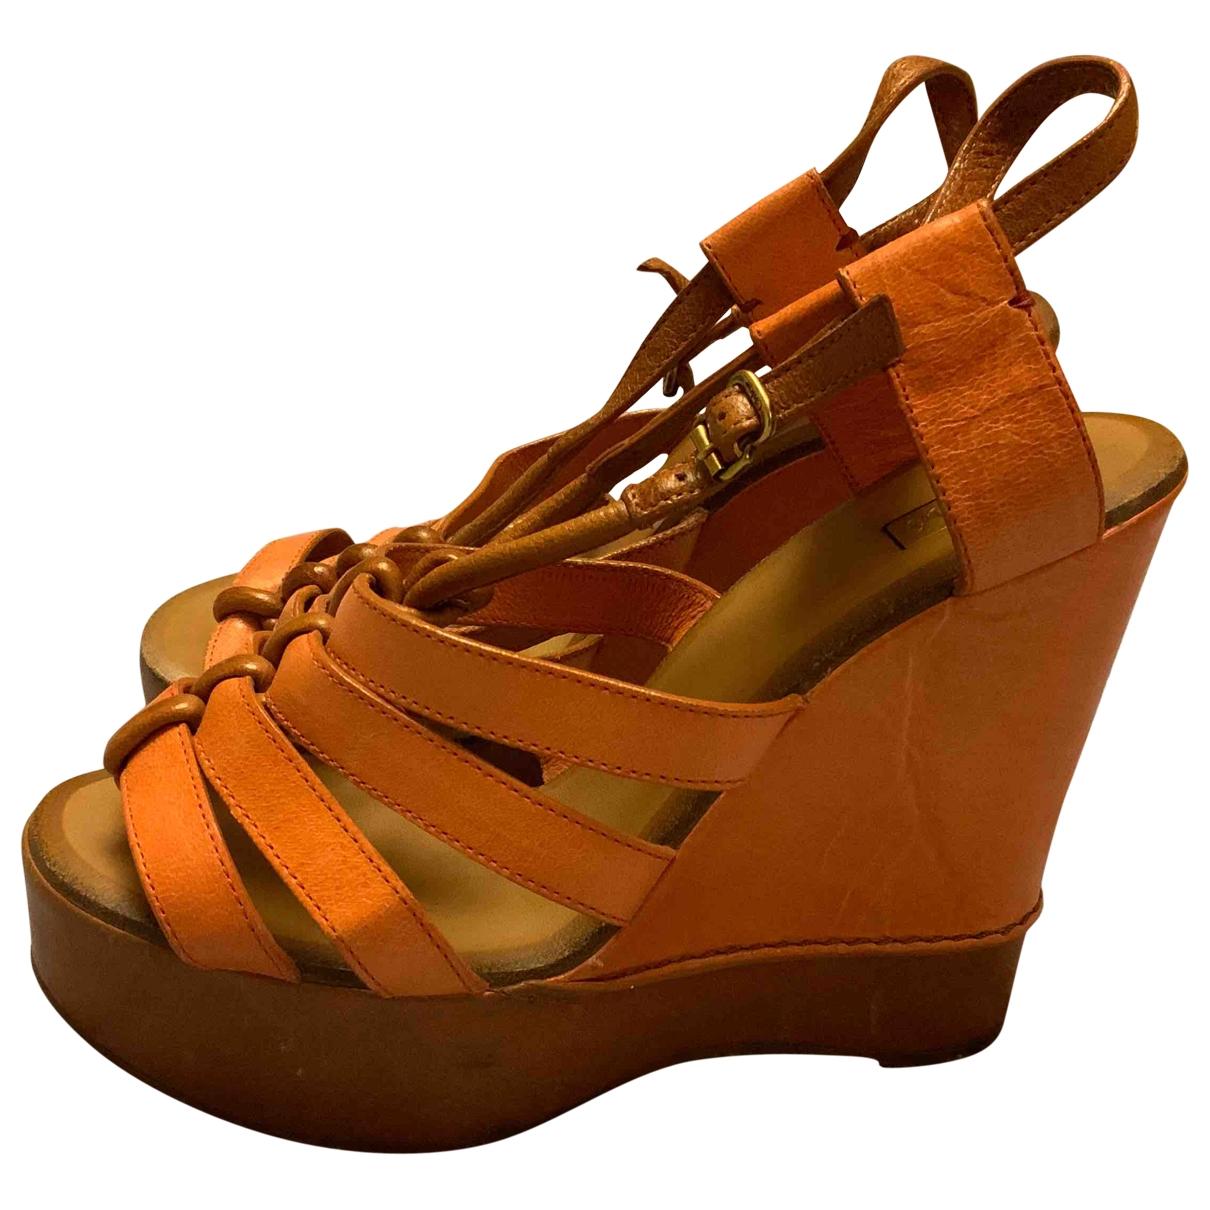 Chloé \N Orange Leather Sandals for Women 38 EU